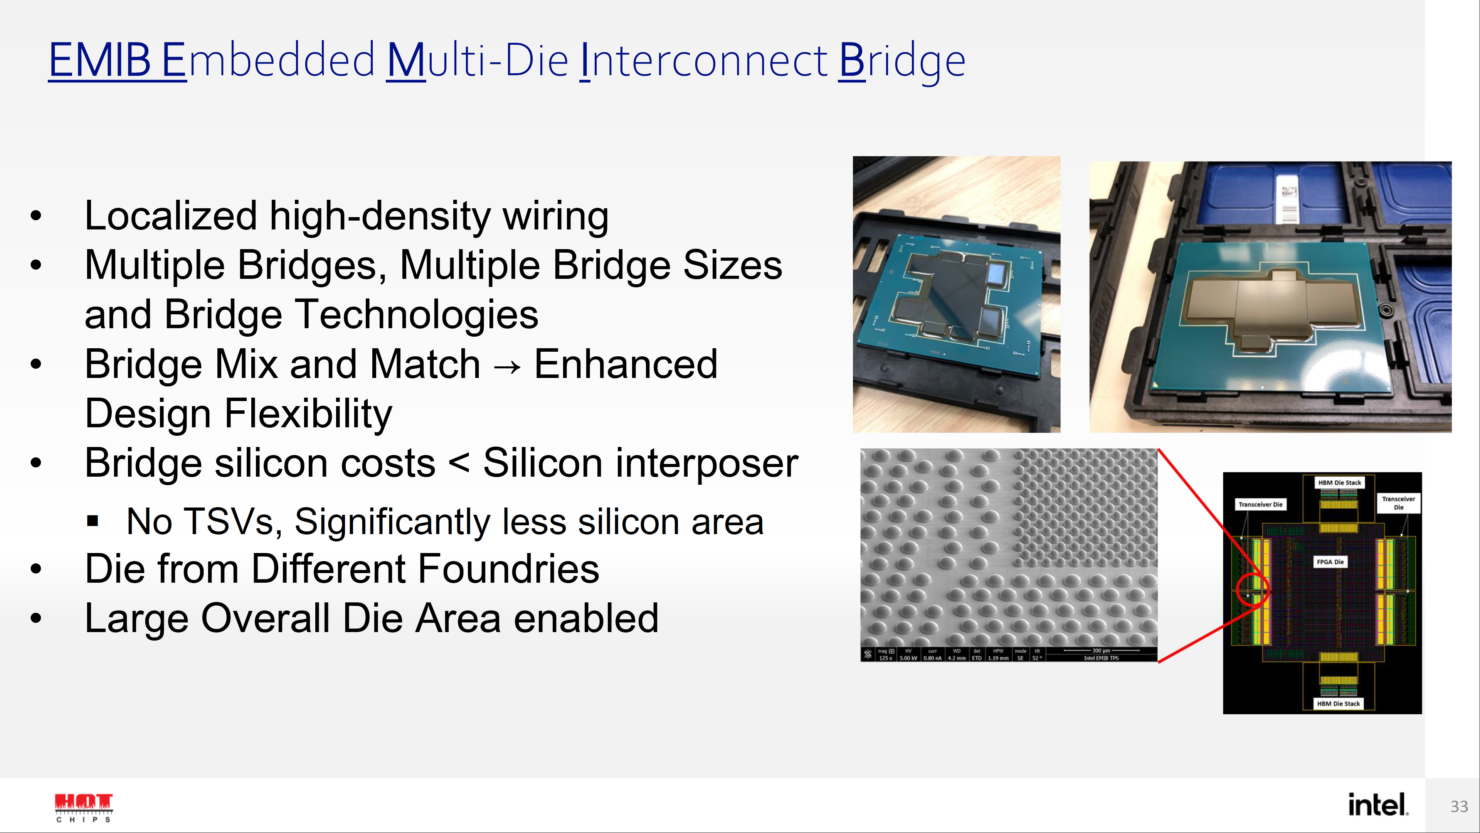 intel-sapphire-rapids-sp-xeon-hbm-cpu-ponte-vecchio-gpu-with-emib-forveros-packaging-technologies-_3